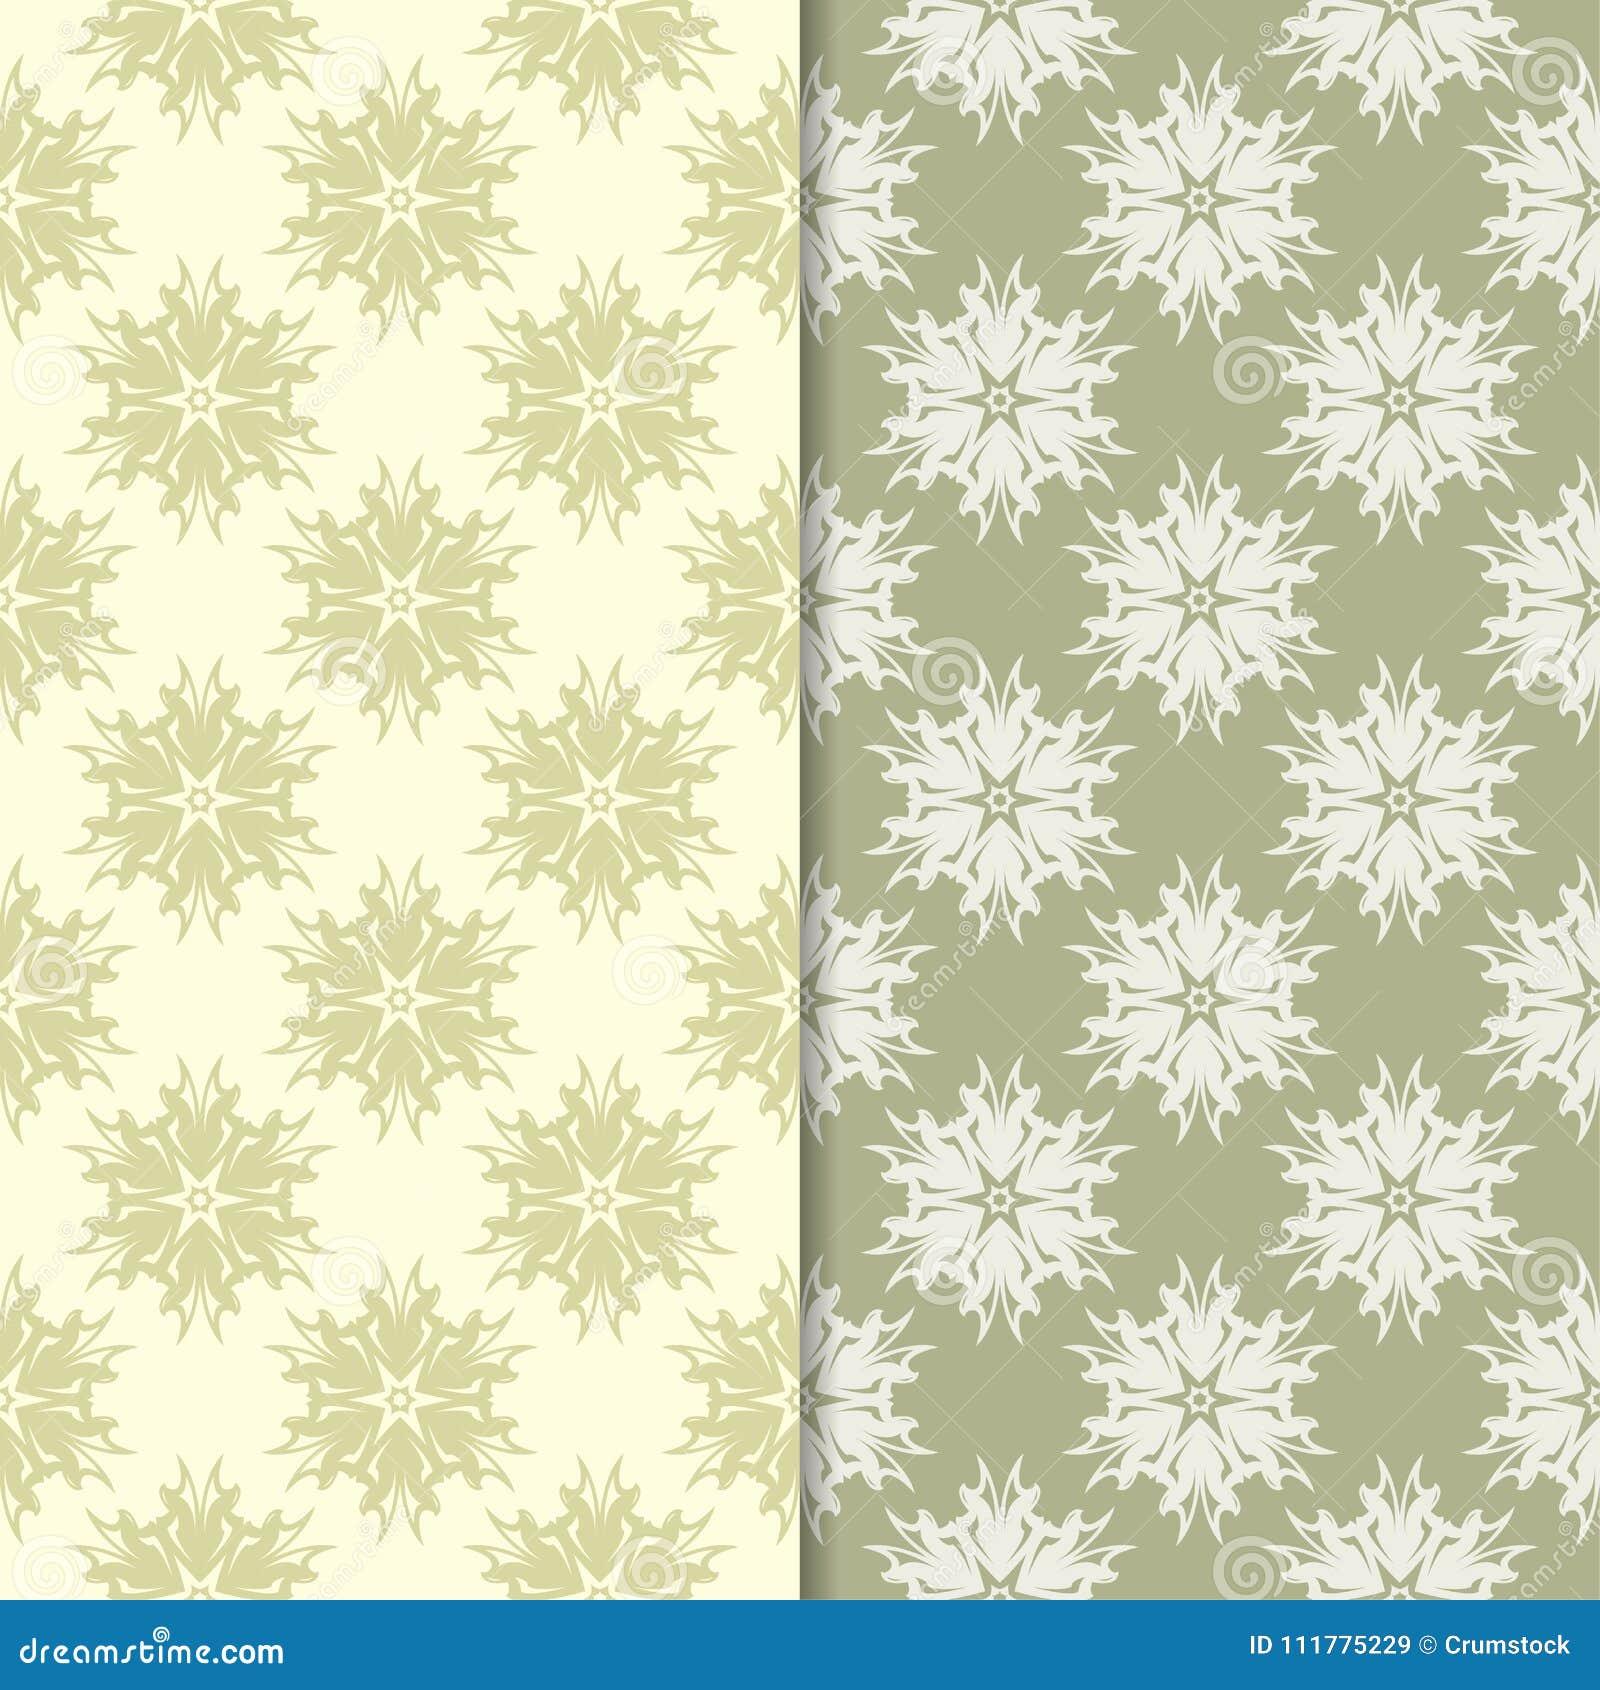 Olive green floral ornamental backgrounds. Set of seamless patterns